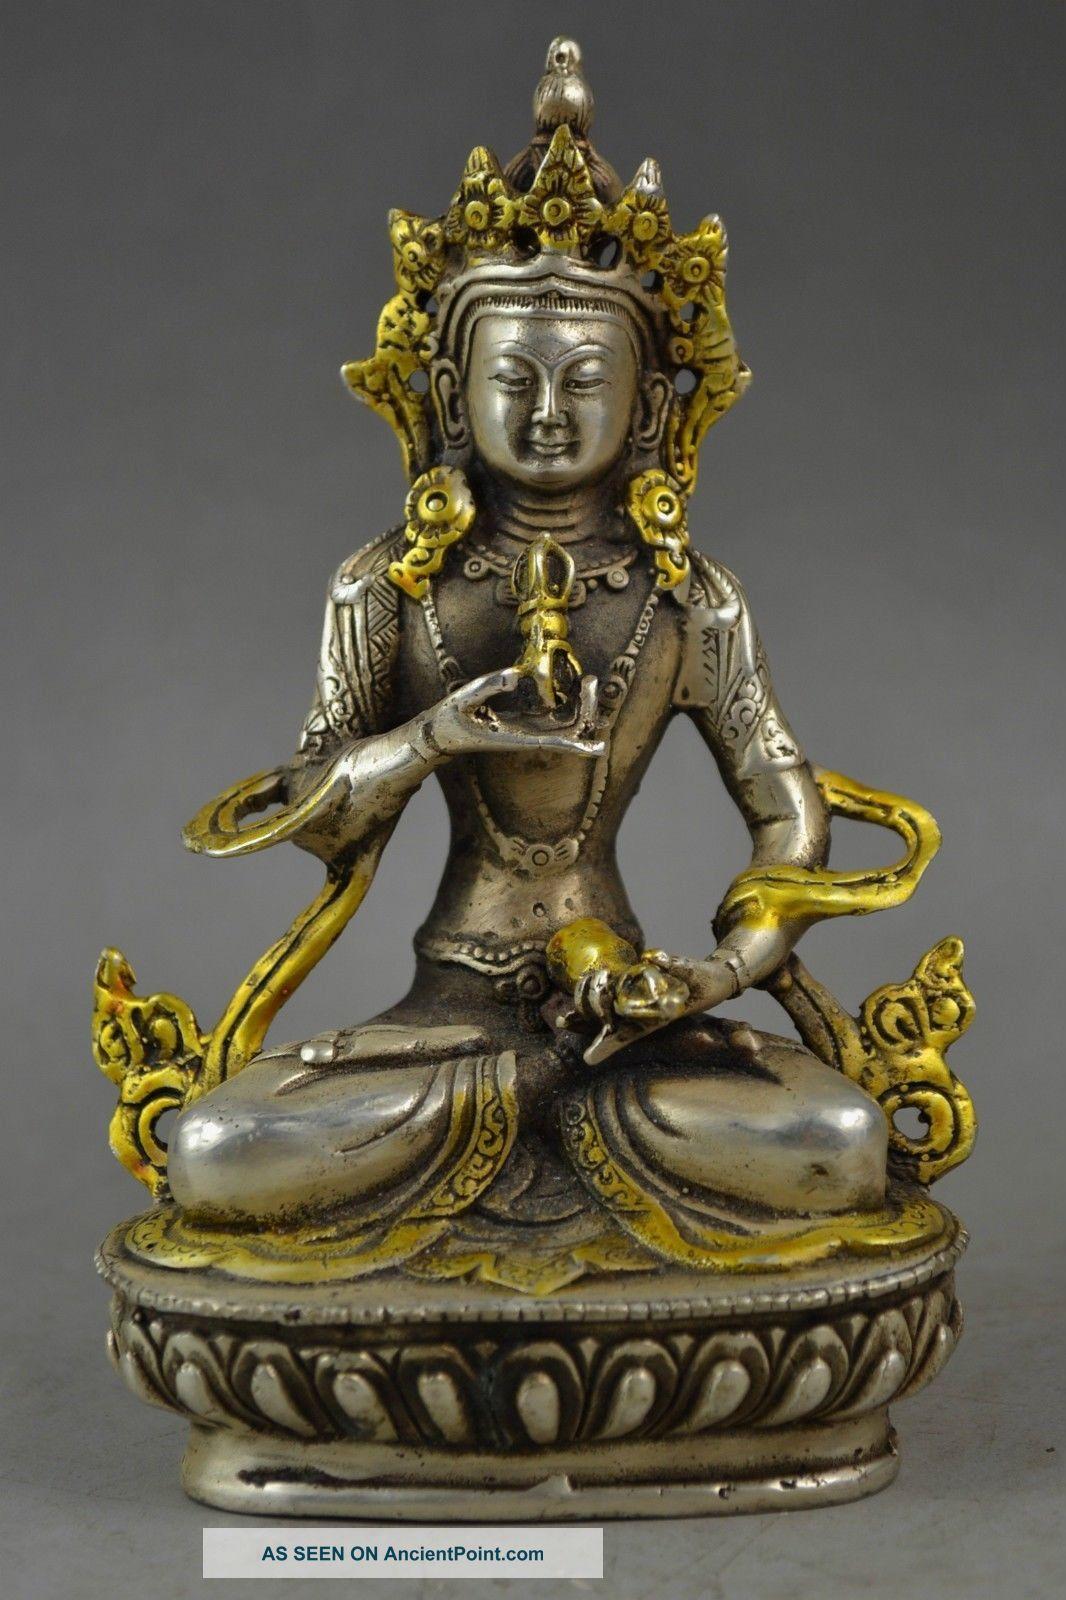 Chinese Tibet Handwork Art Cupronickel Carving Lamaism Devout Buddha Statue Buddha photo